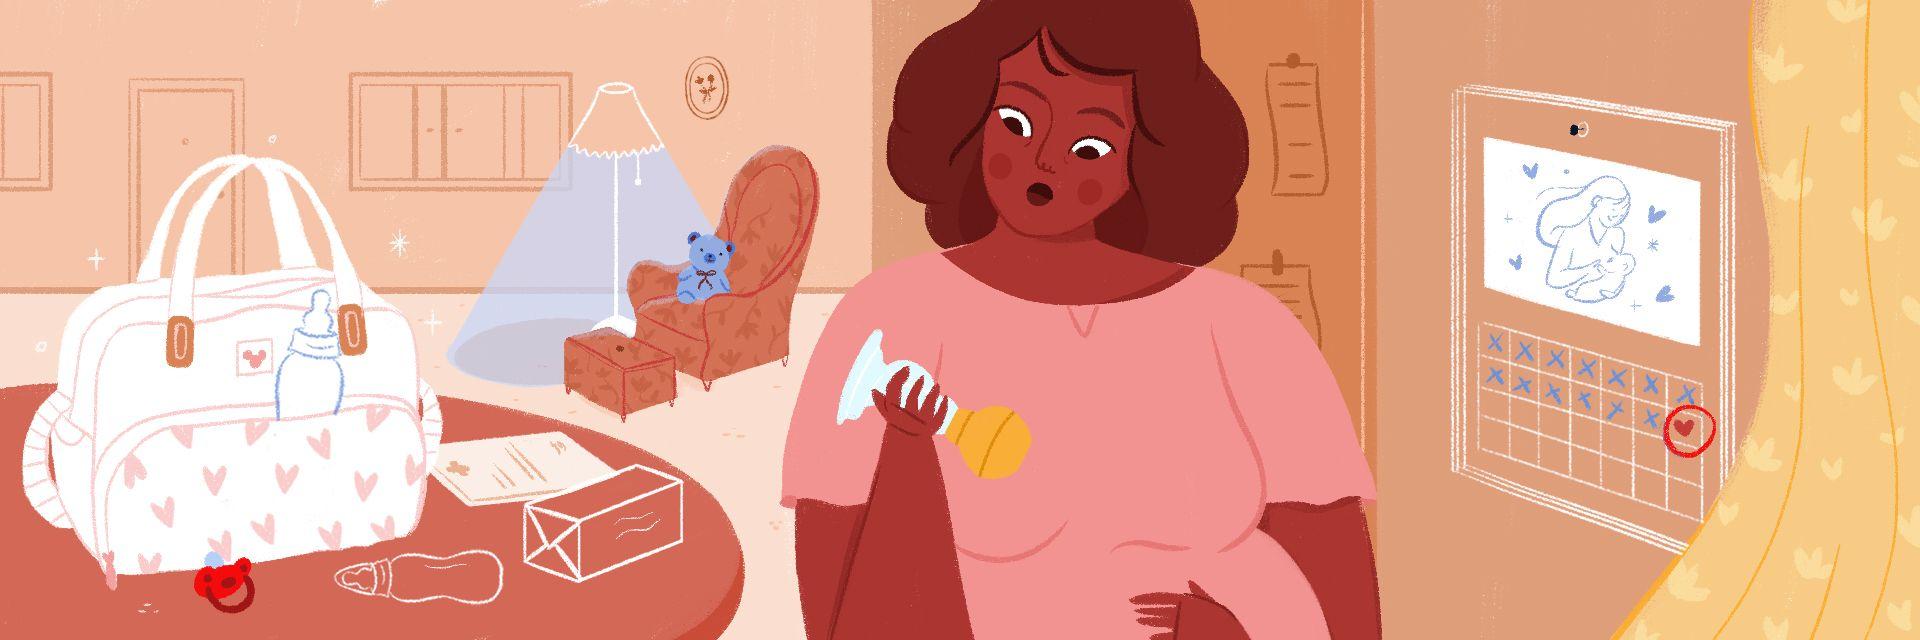 Maternidade sem filtro - Parte II